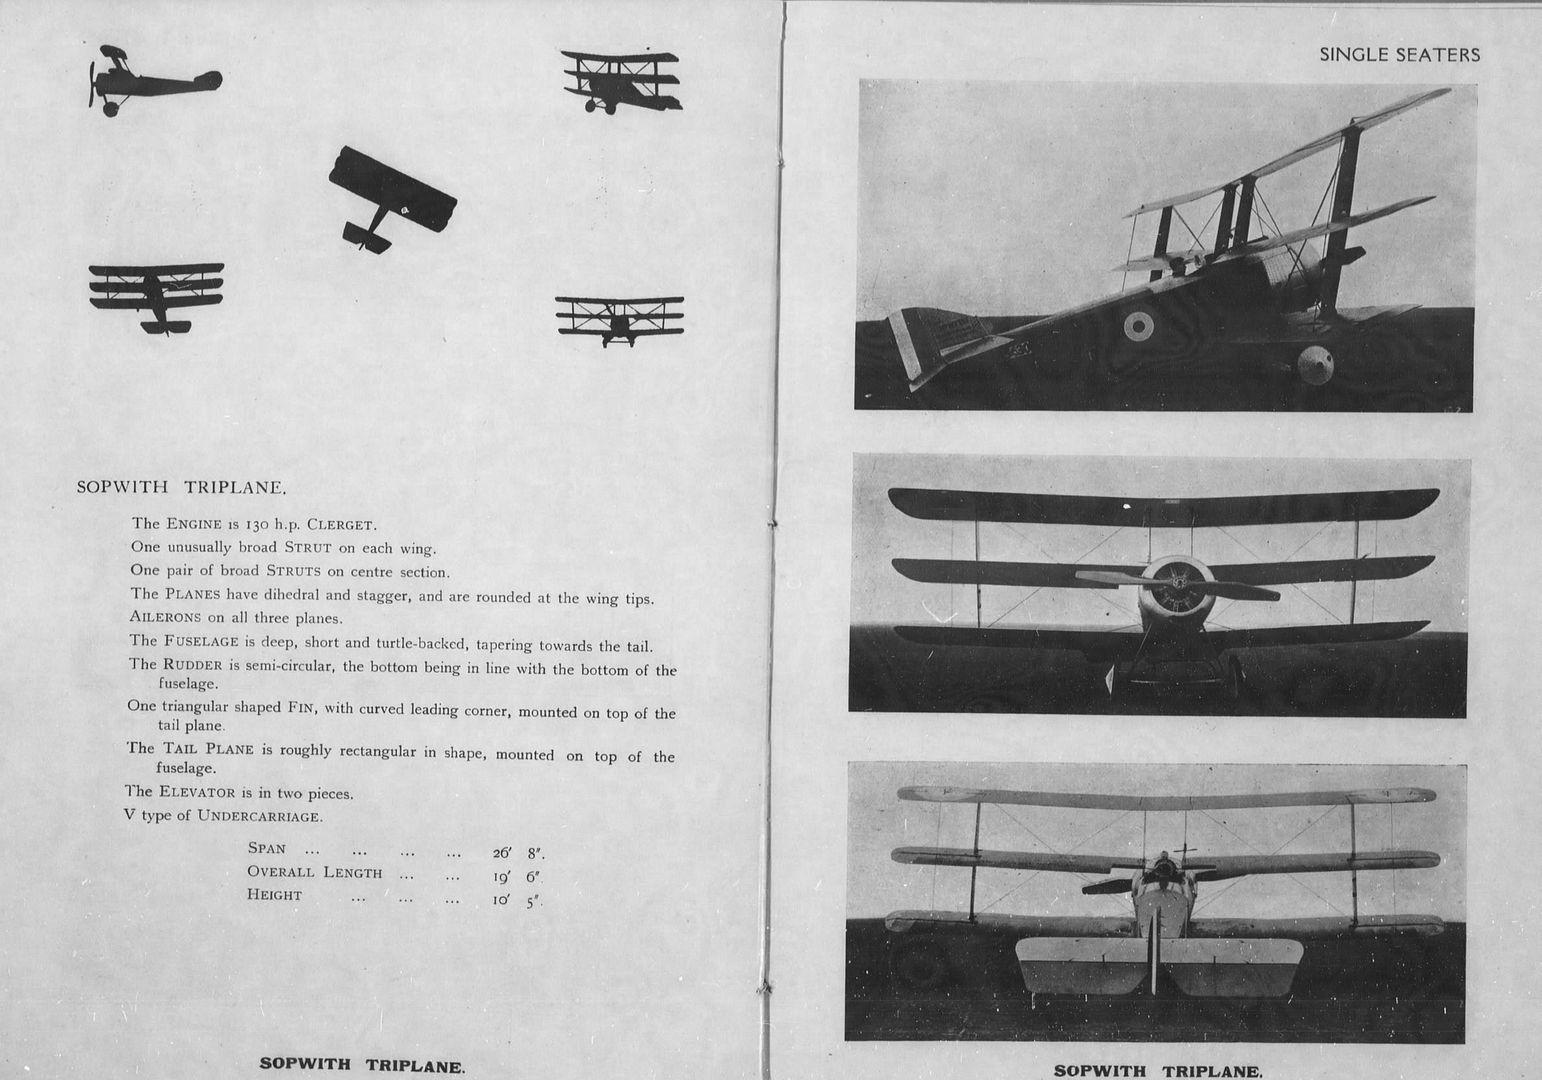 Aircraft Recognition Tripehound